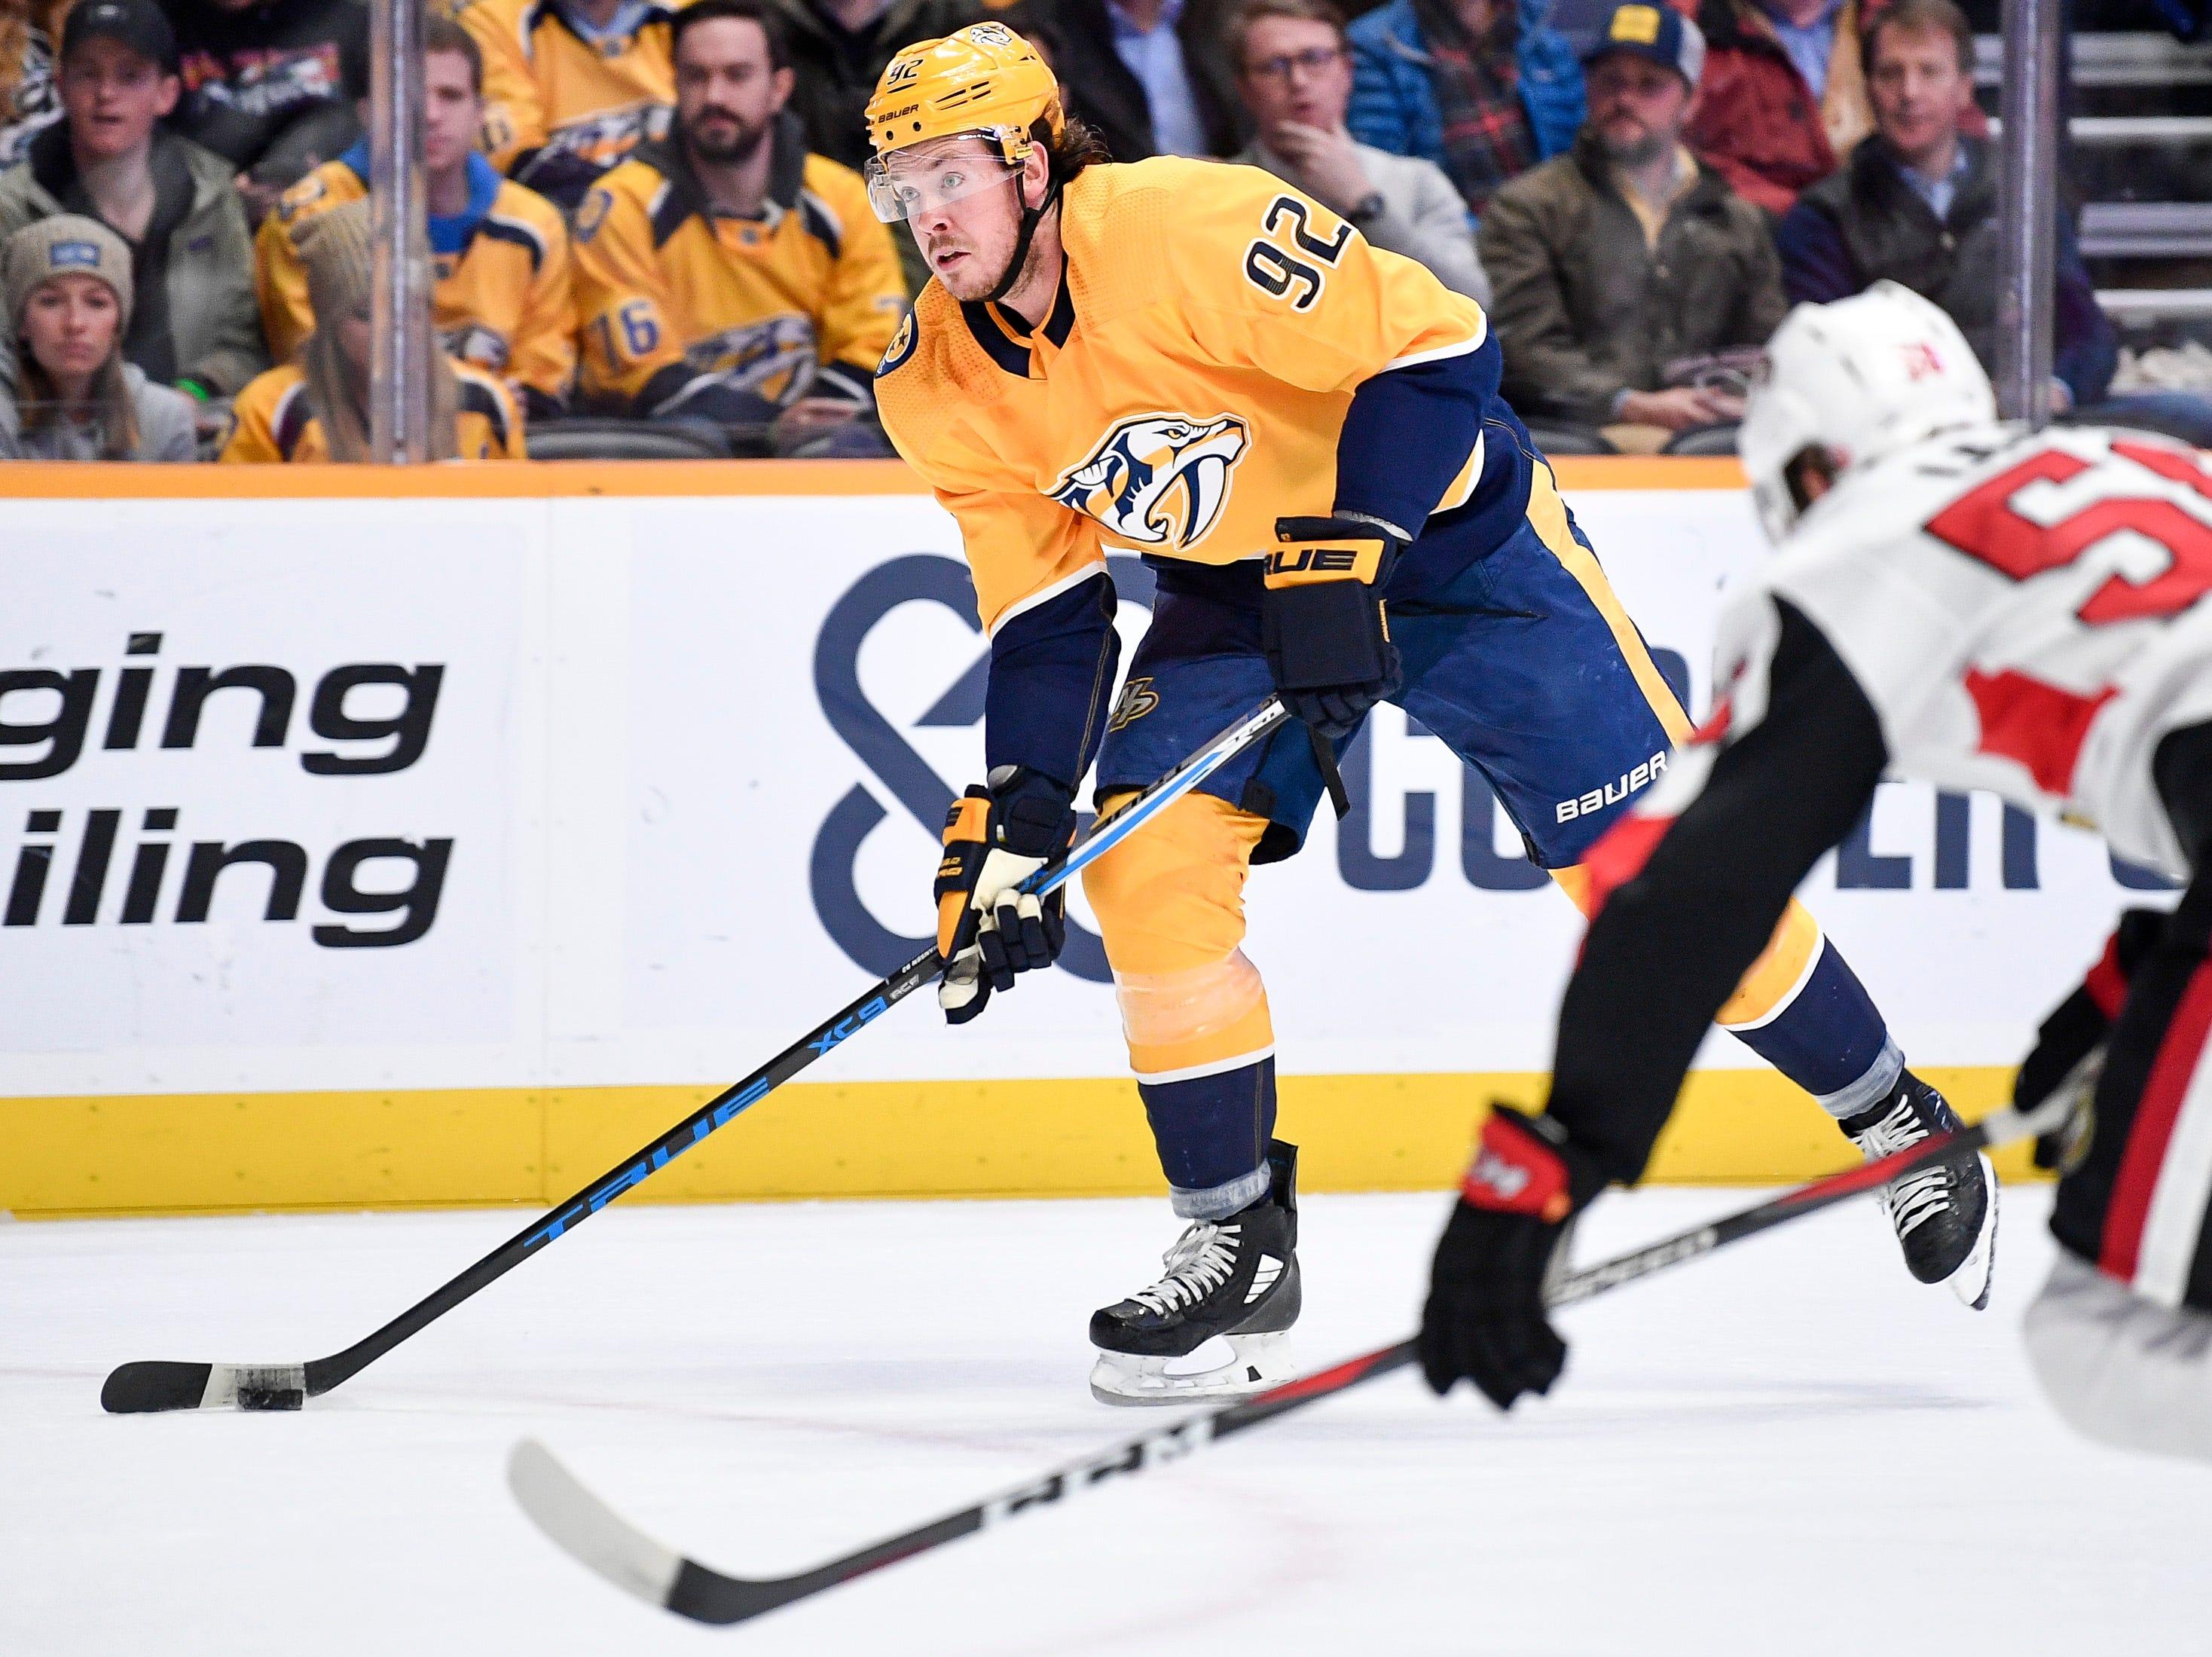 Nashville Predators center Ryan Johansen (92) advances into the path of Ottawa Senators defenseman Maxime Lajoie (58) during the first period at Bridgestone Arena in Nashville, Tenn., Tuesday, Dec. 11, 2018.